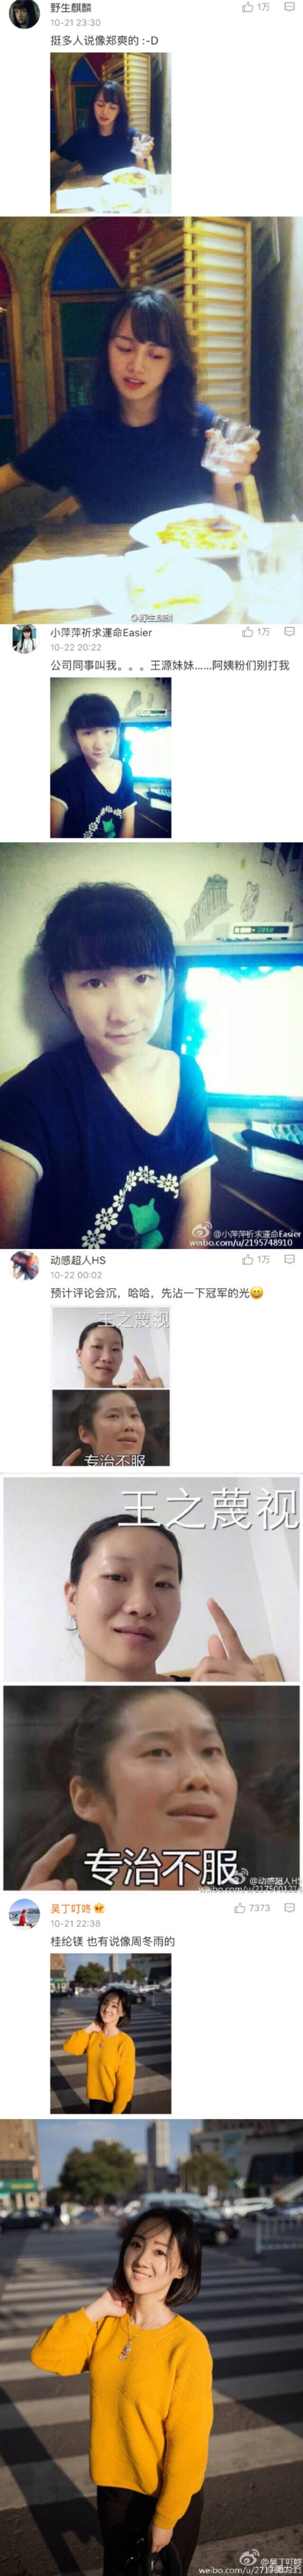 mingxing5